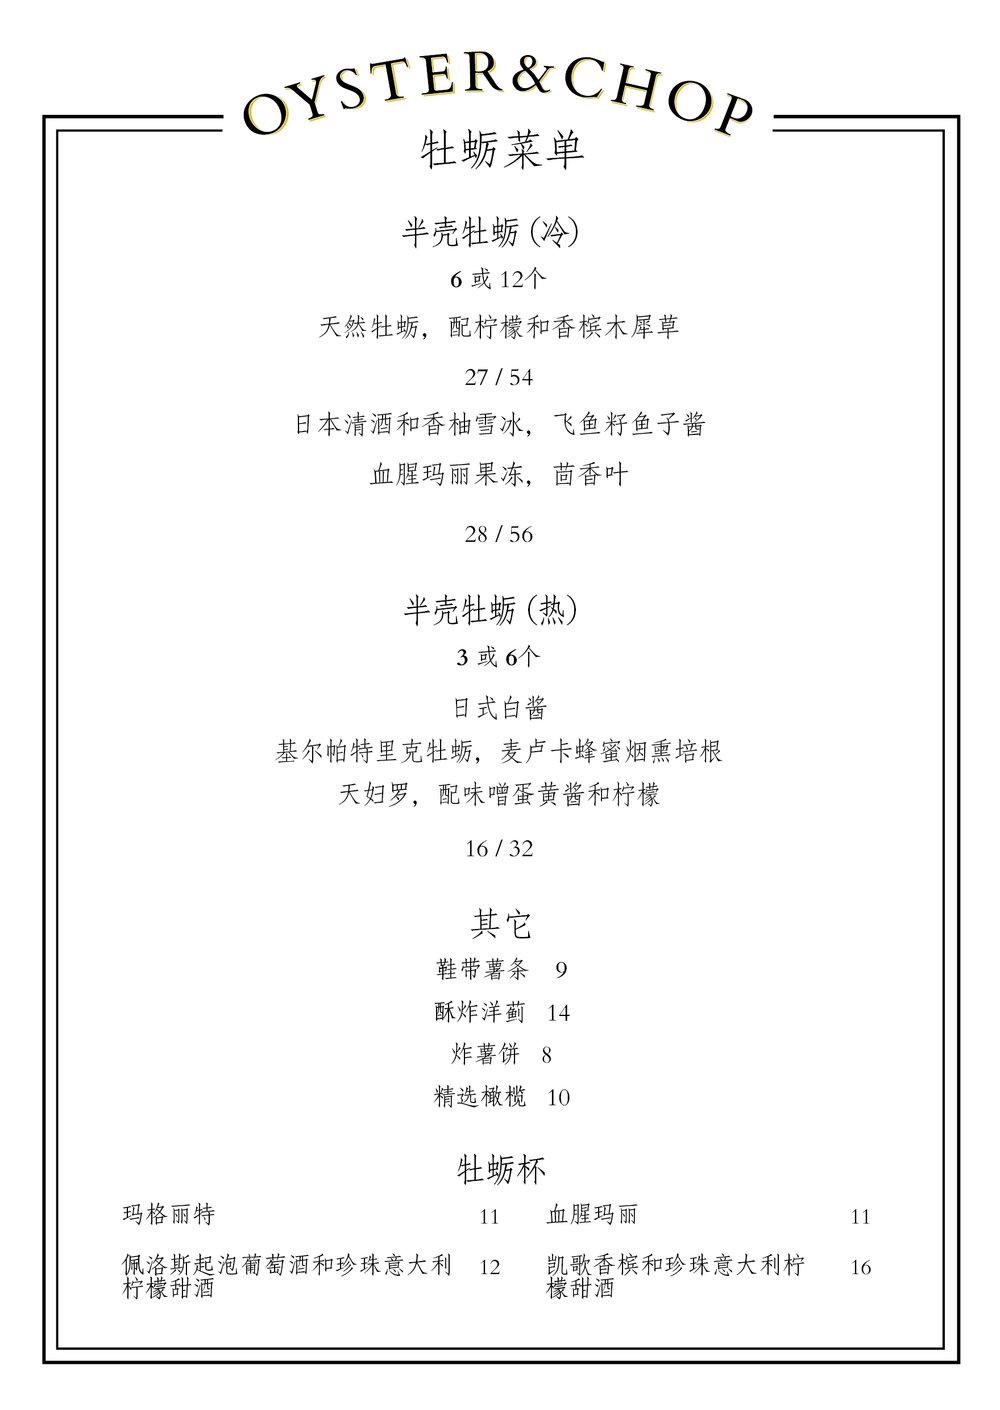 Oyster Menu 2017 - chinese.jpg